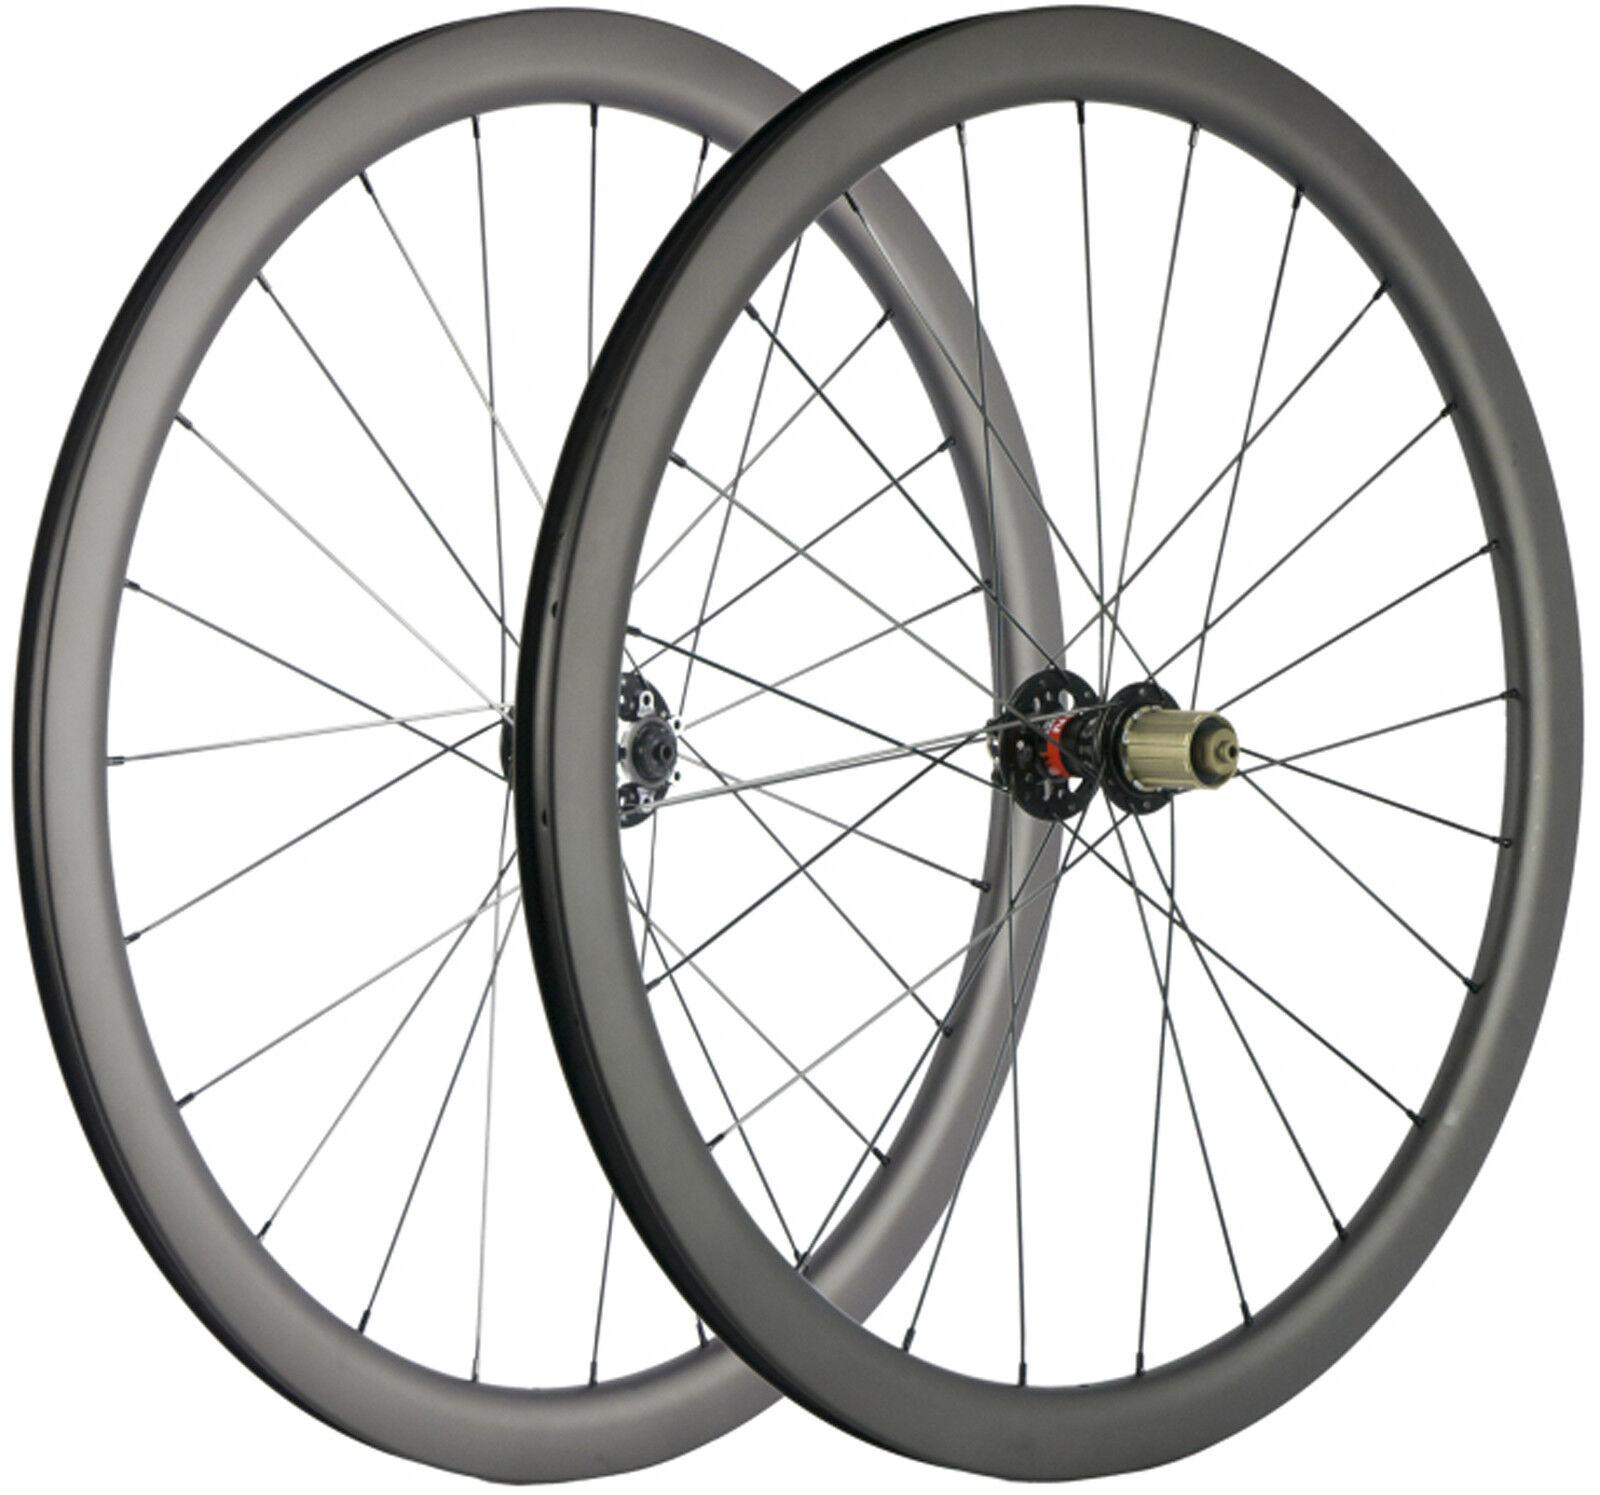 Carbon Cyclocross Wheels Disc Brake 40mm Depth 25mm U Shape Thru Alxe QR Wheels